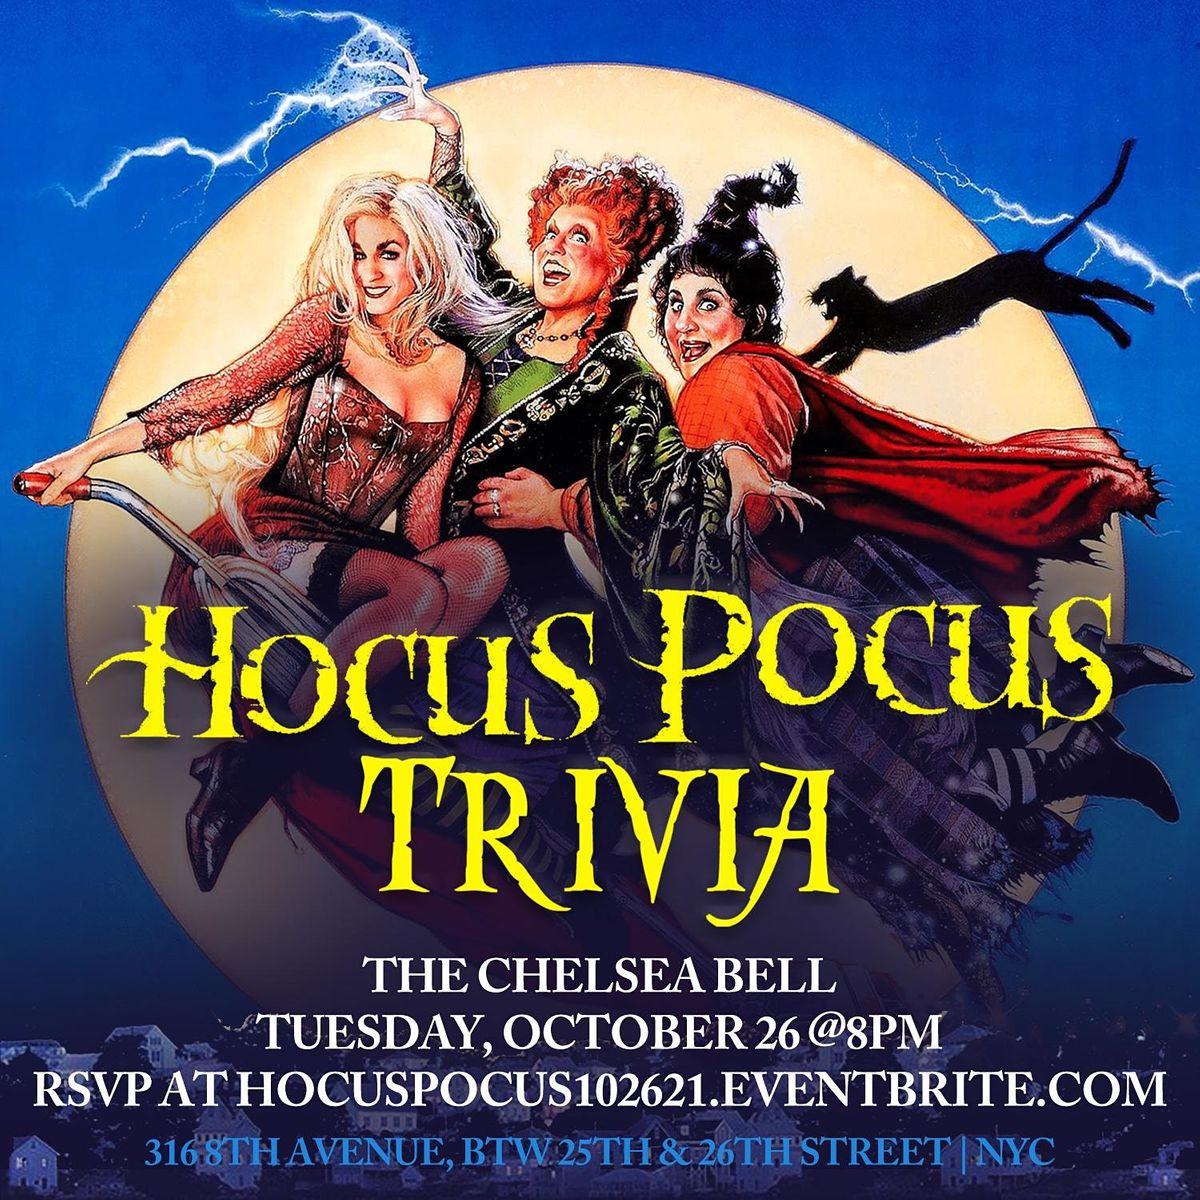 Hocus Pocus Trivia, 26 October | Event in New York | AllEvents.in